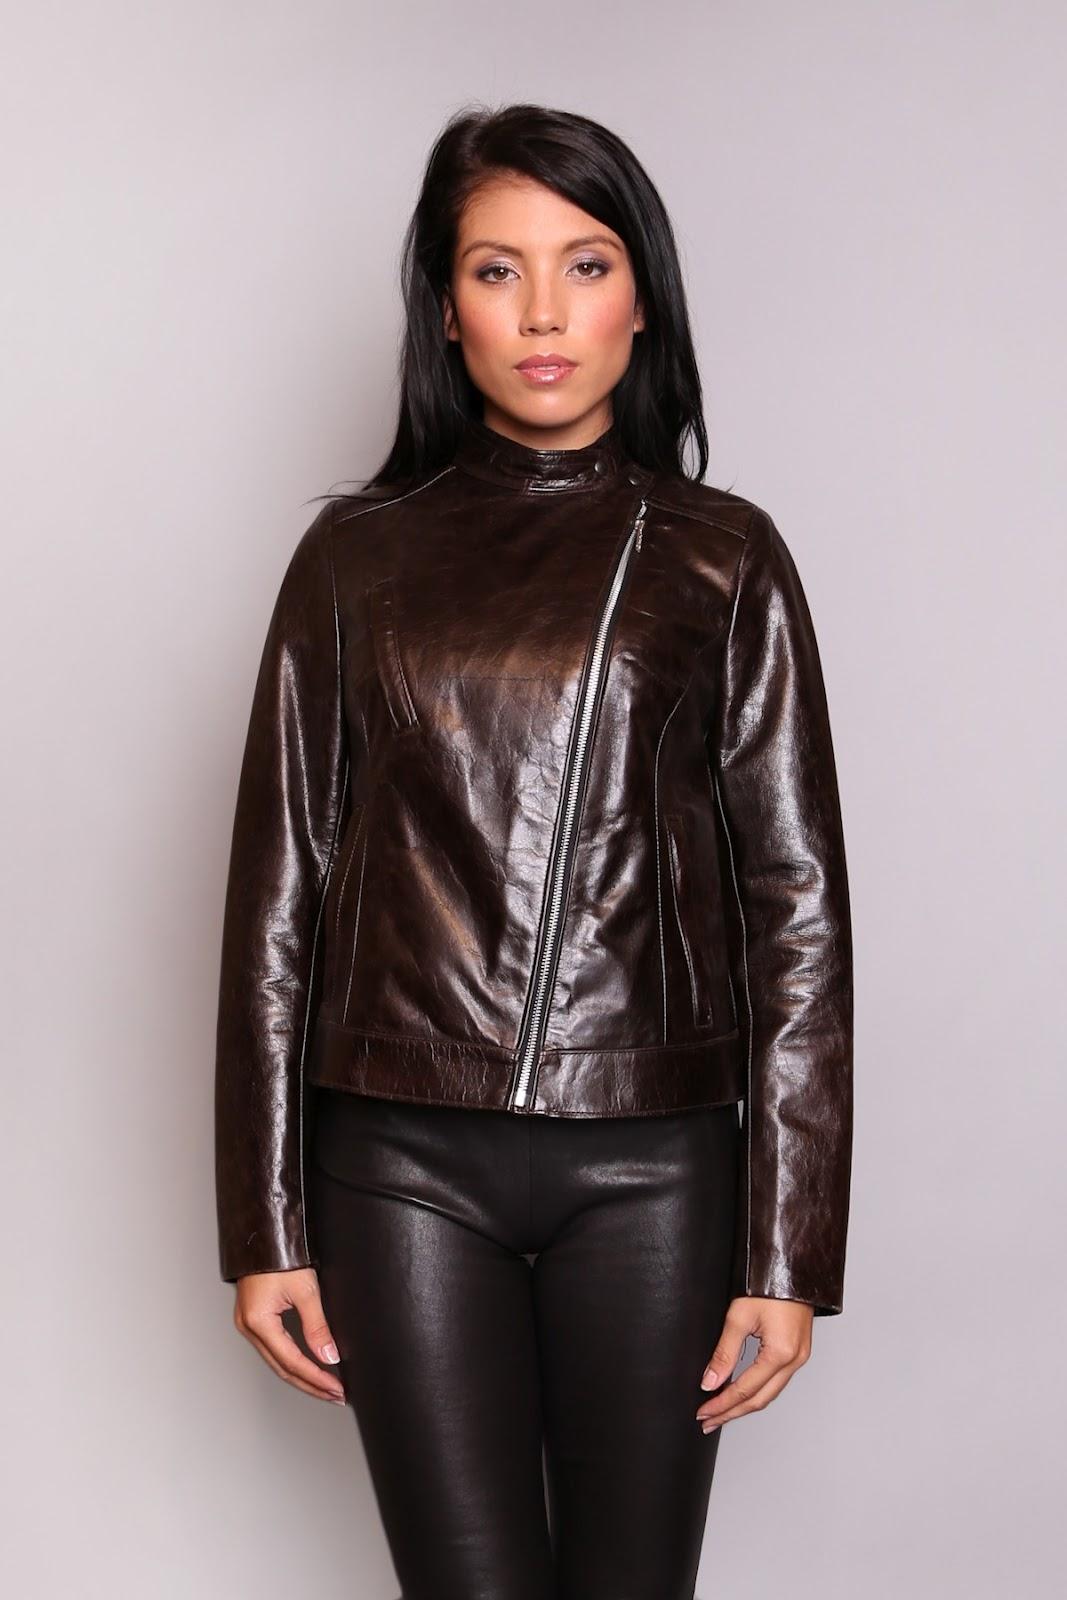 cuir femme blouson cuir marron veste en cuir marron par. Black Bedroom Furniture Sets. Home Design Ideas